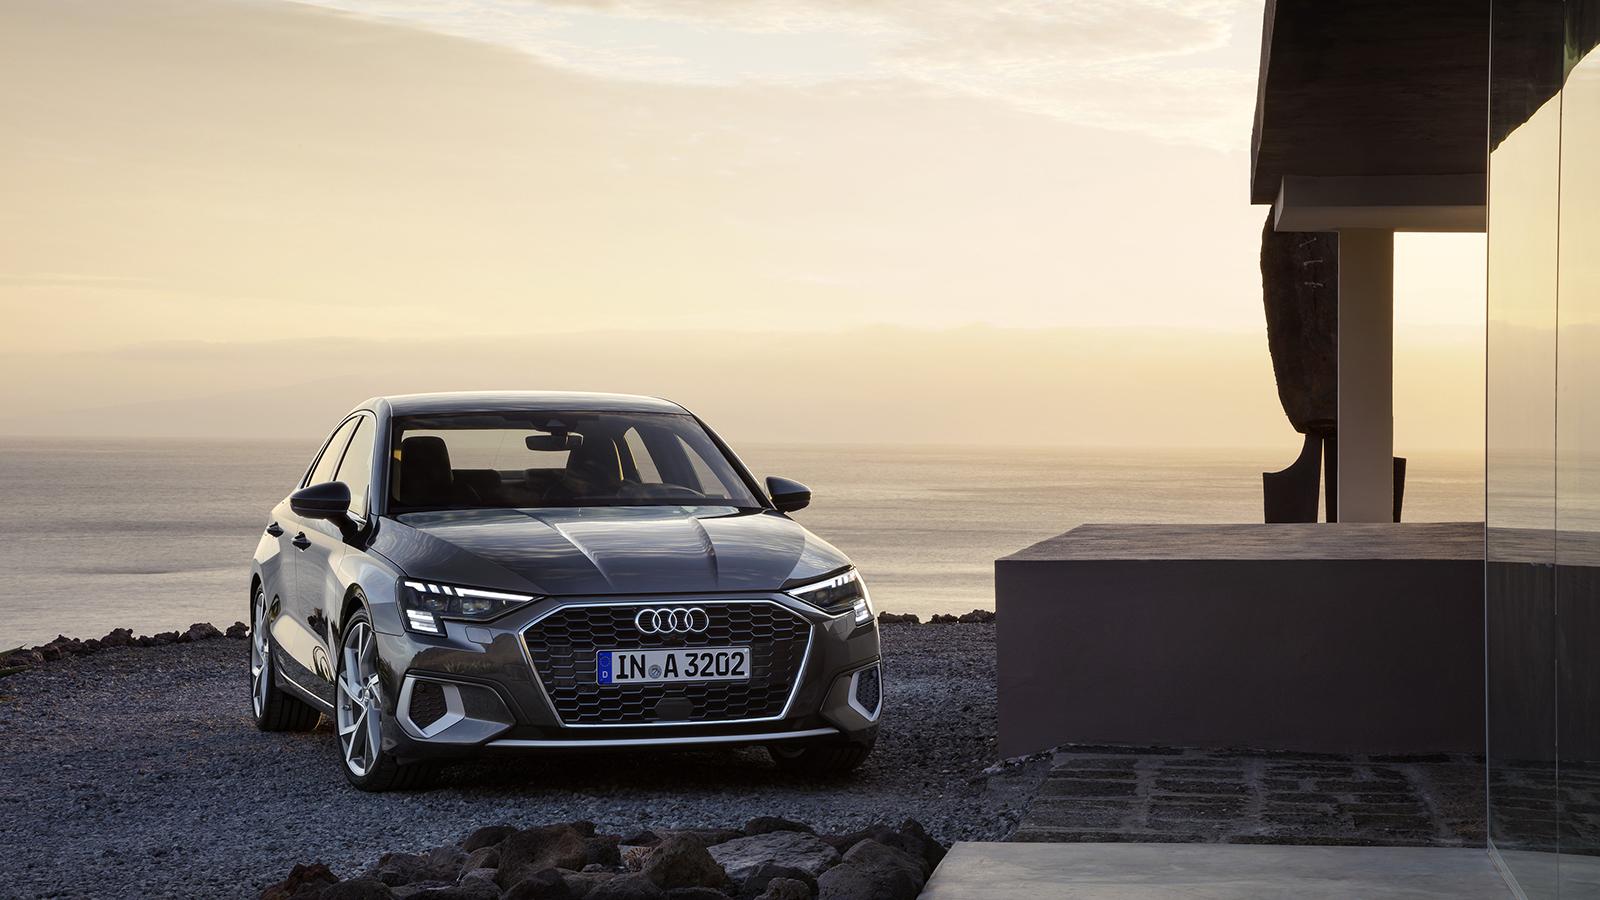 Audi-S4-Nogaro-Blue-Nardo-Grey-Keys-Audi-826